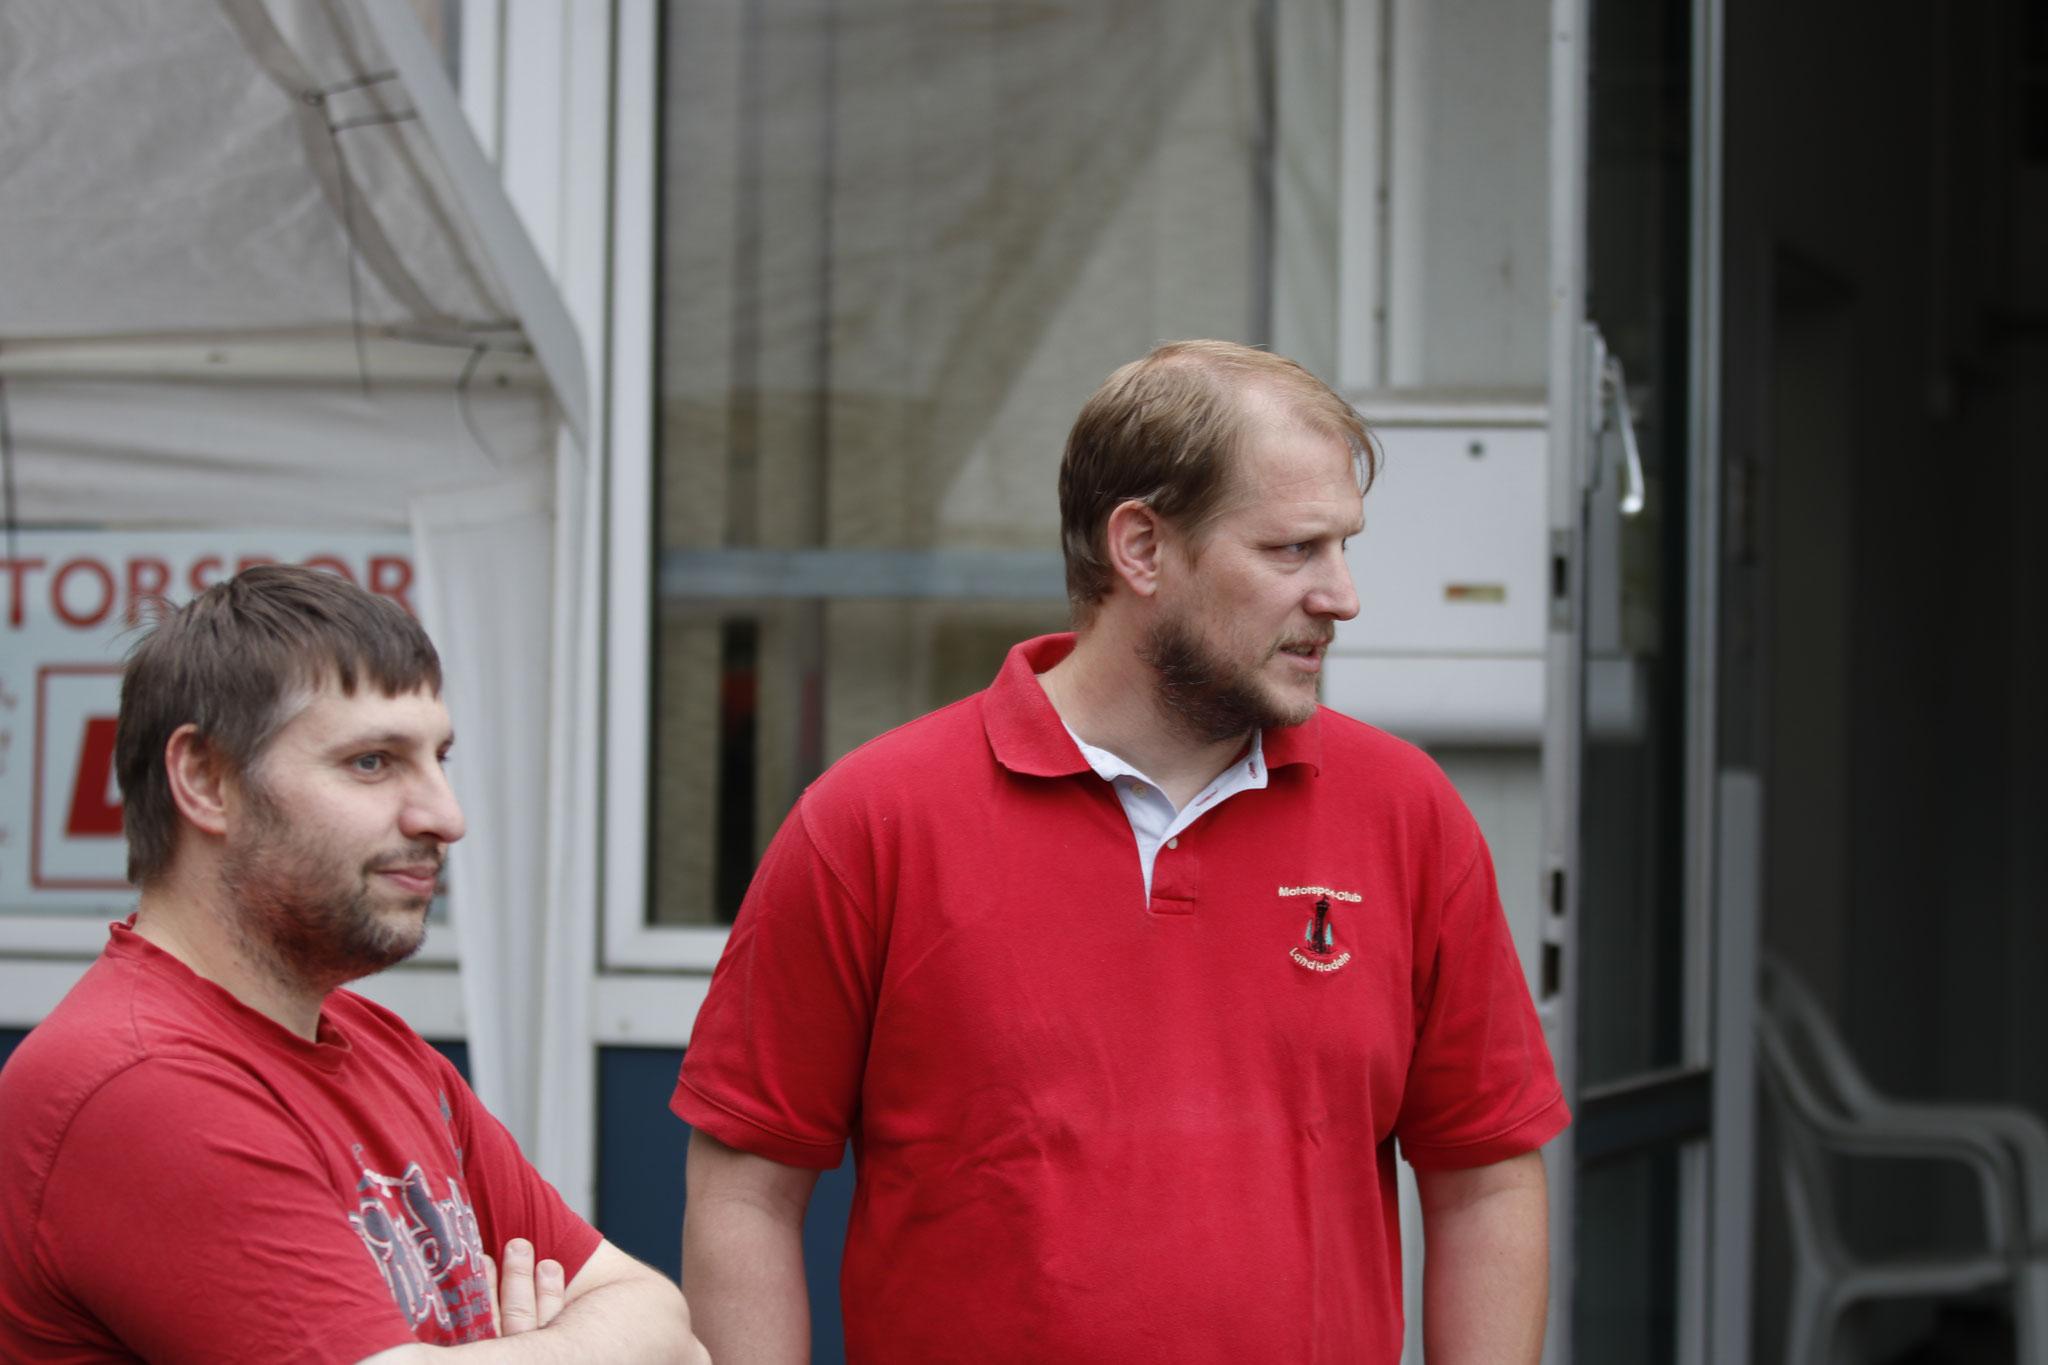 v.li. Sven Petzold und Carsten Schlüer